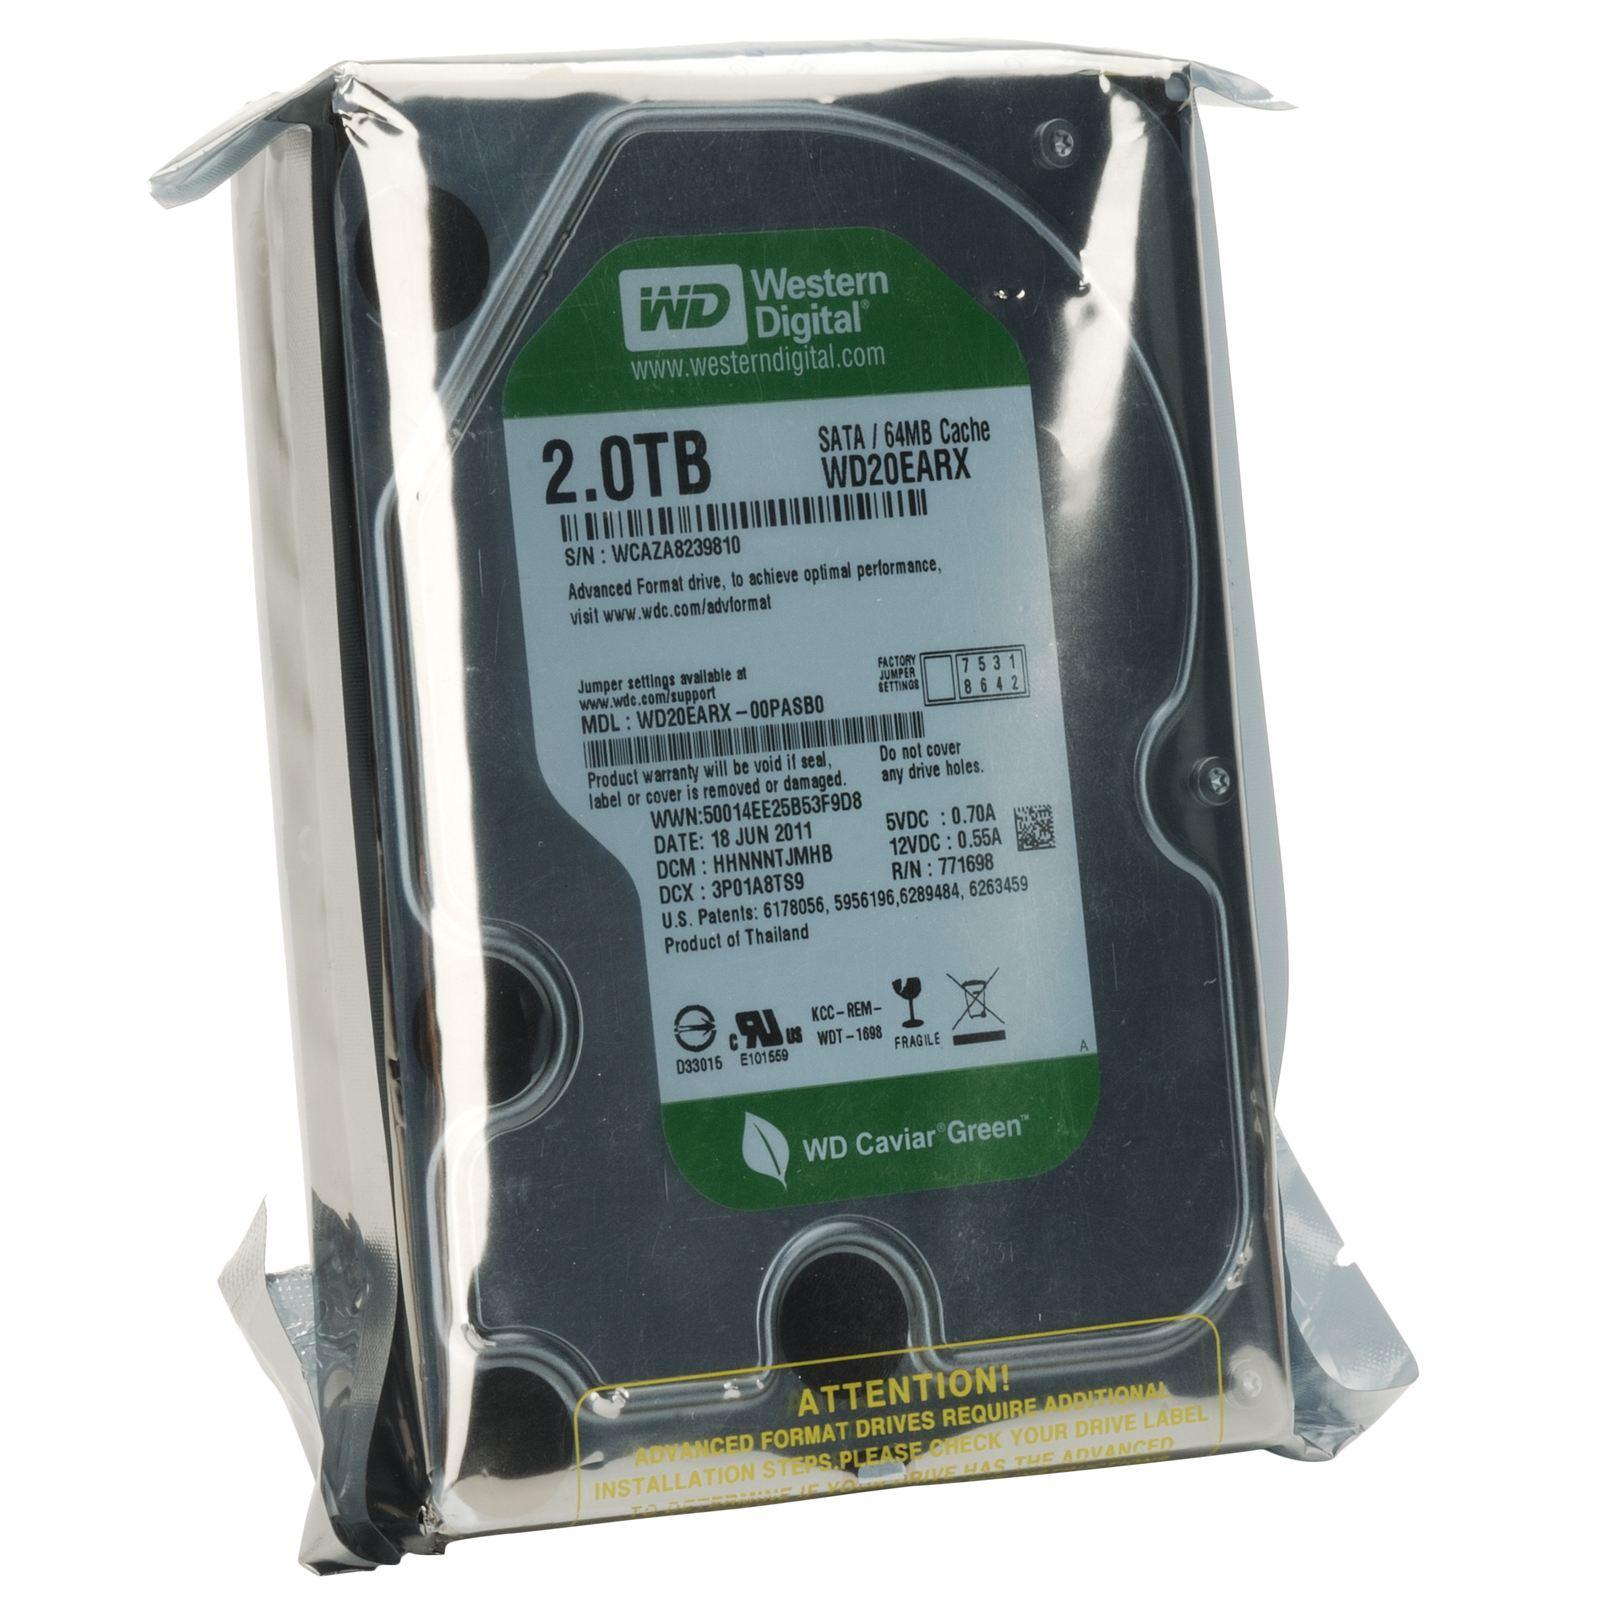 Жесткий диск western digital 2tb green, wd20ezrx, 35, 5400rpm, 64mb, sata3